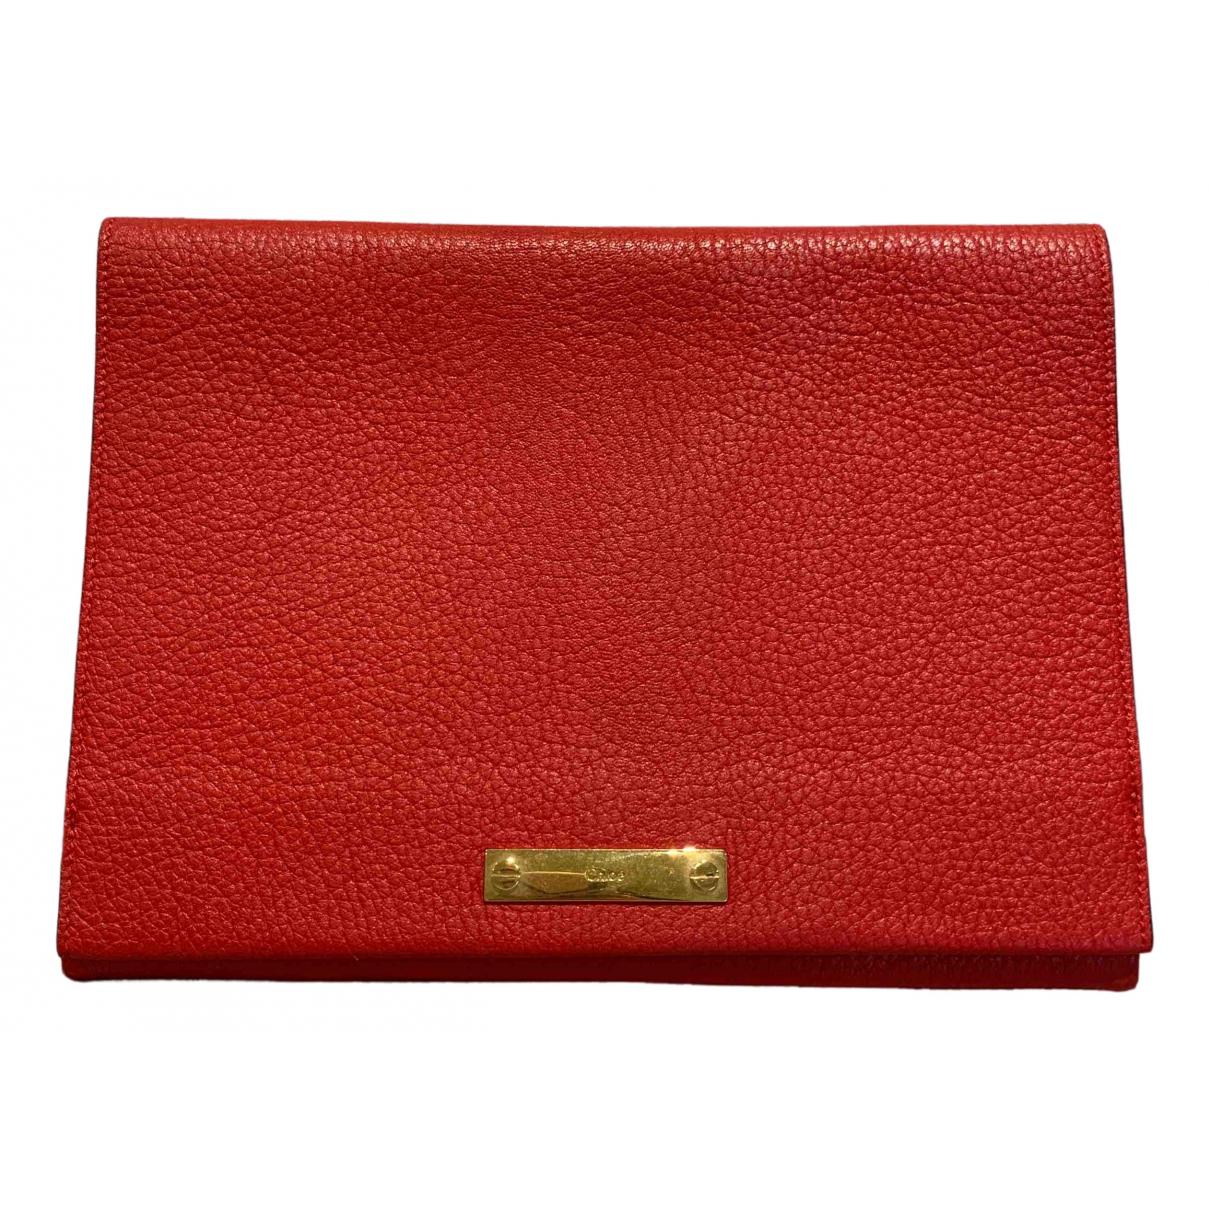 Chloe \N Clutch in  Rot Leder